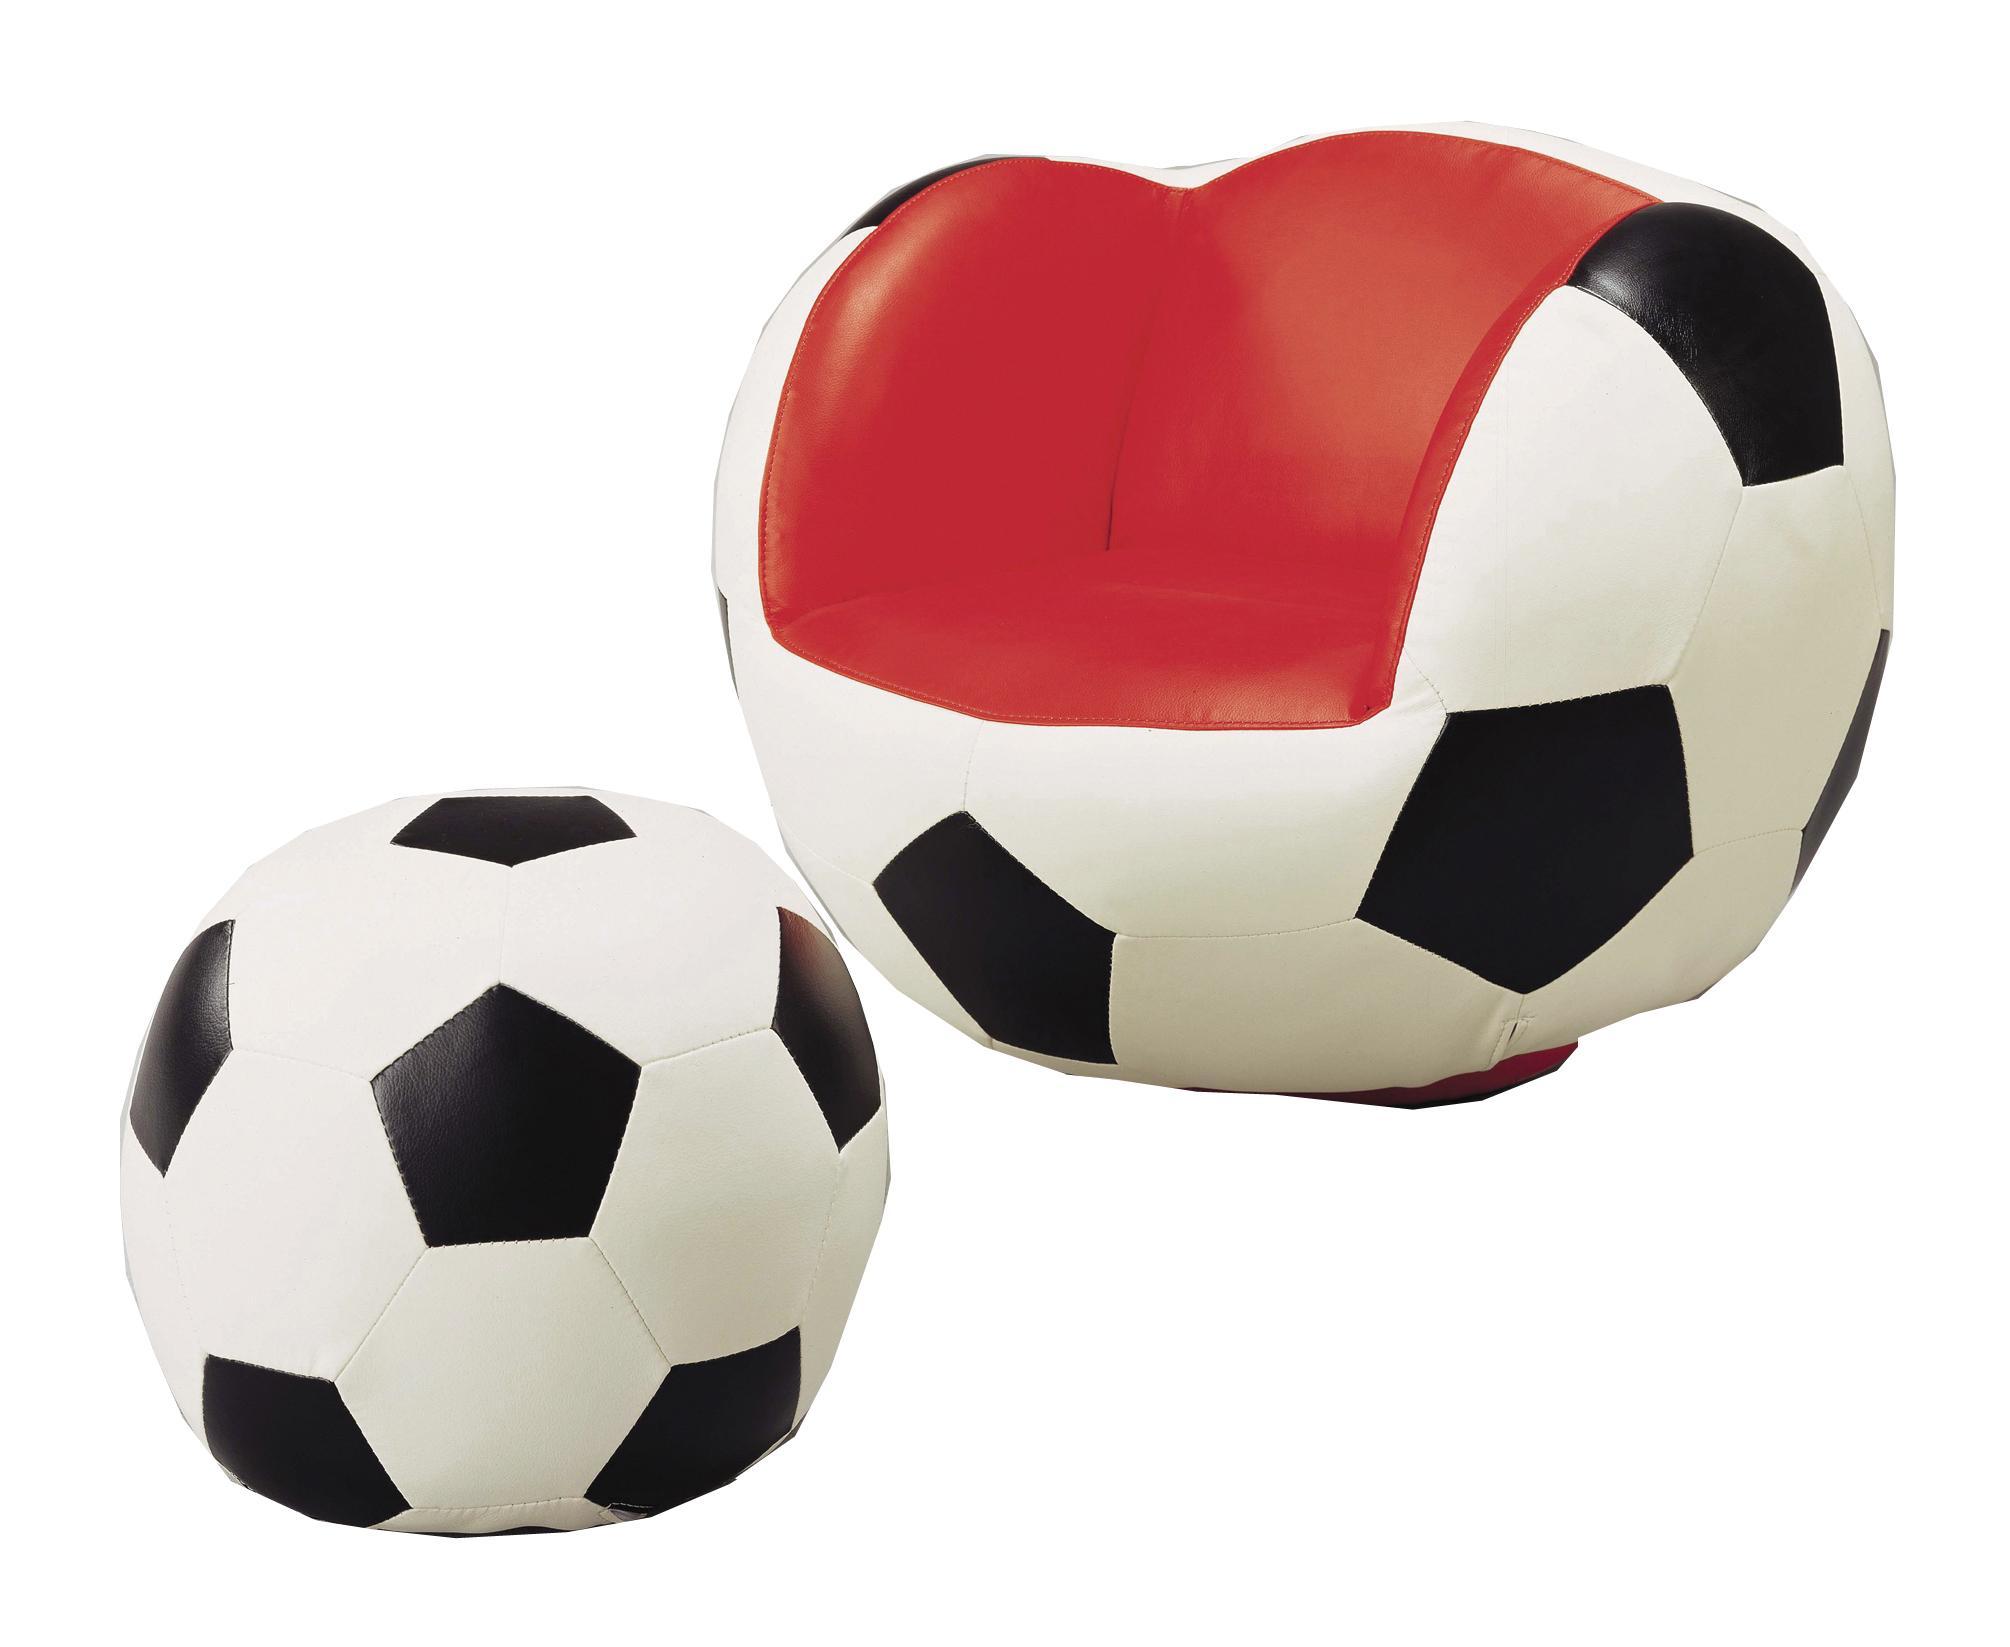 Charmant Crown Mark Kids Sport Chairs Soccer Swivel Chair U0026 Ottoman